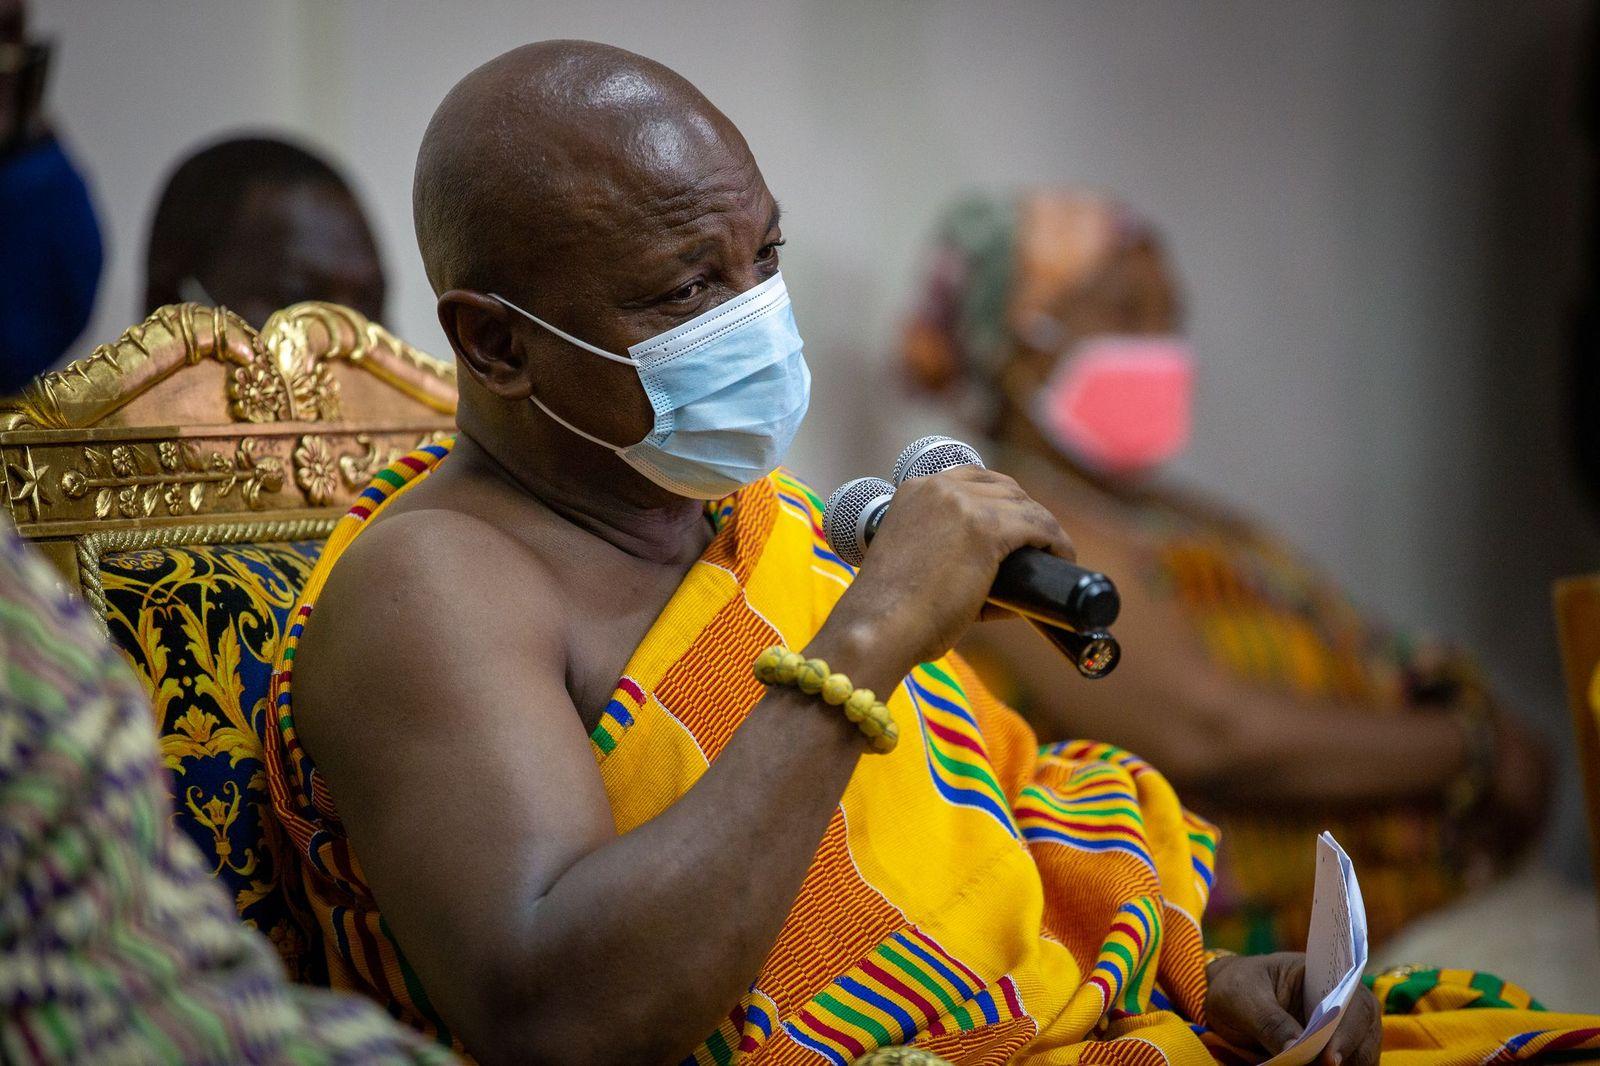 Photos - COURTESY CALL ON AGBOGBOMEFIA TOGBE AFEDE XIV BY BANDA DELEGATION FROM BONO REGION